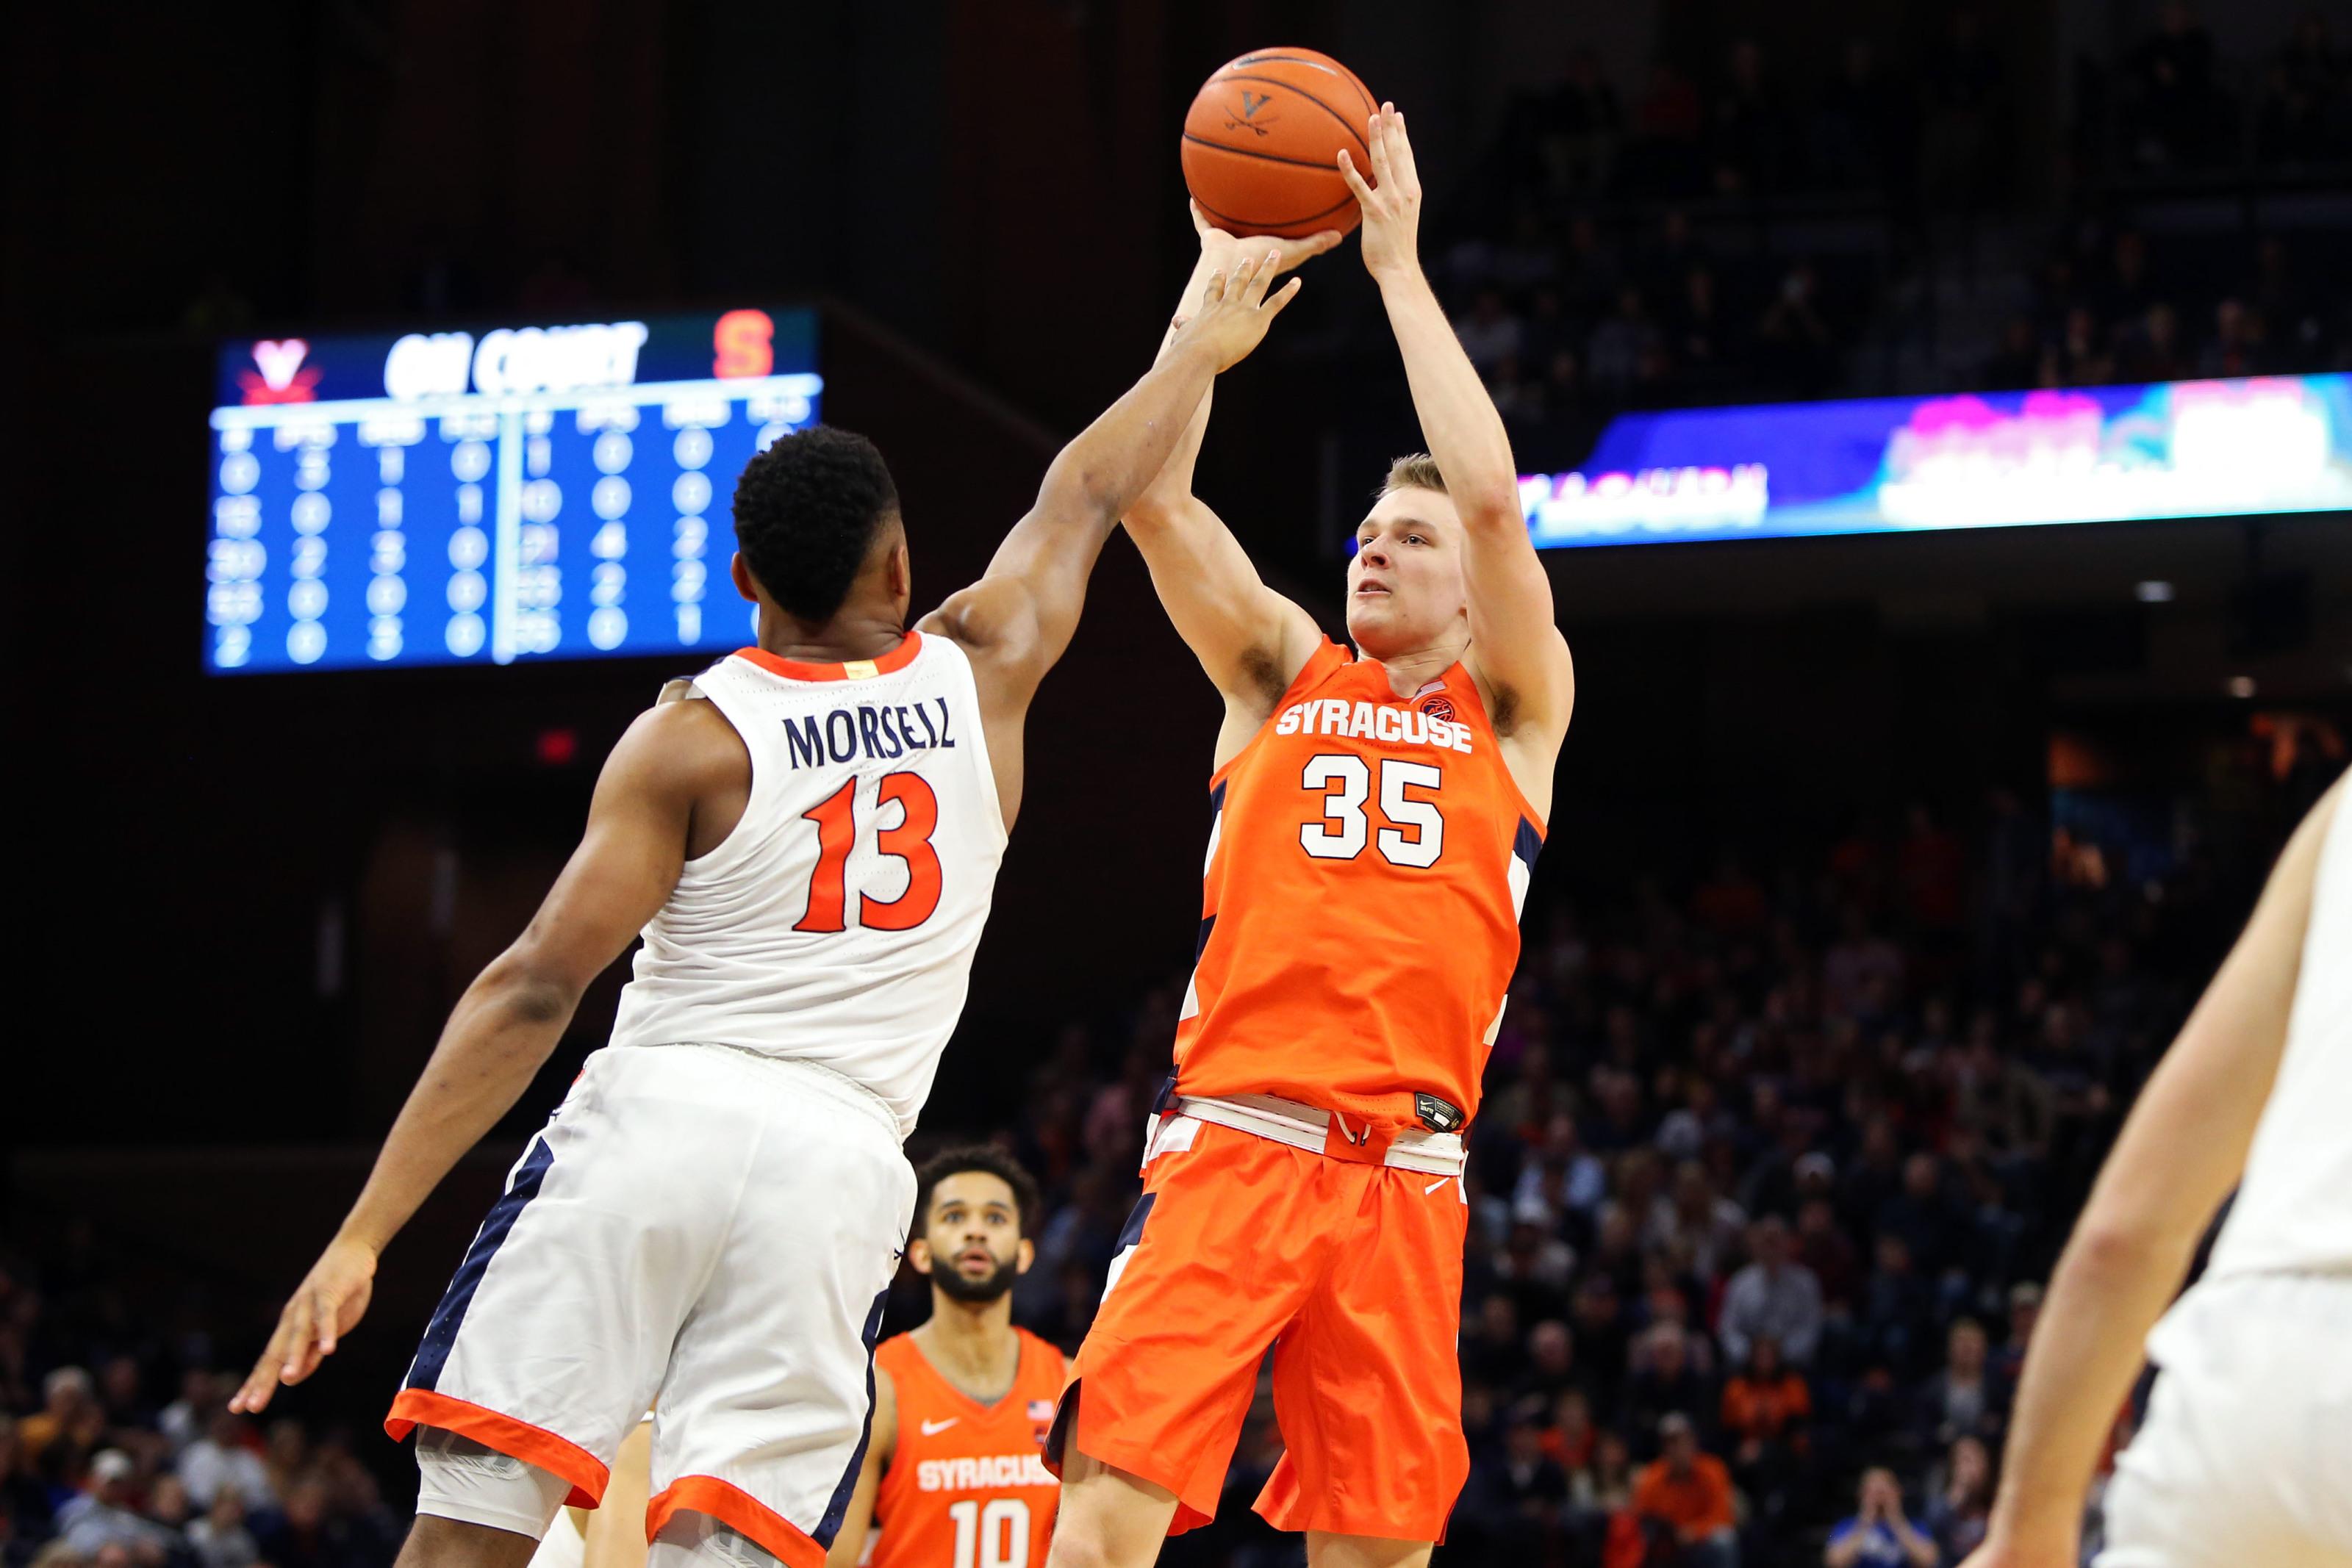 Syracuse Basketball 7 Transfers To Consider Adding For 2020 21 Season